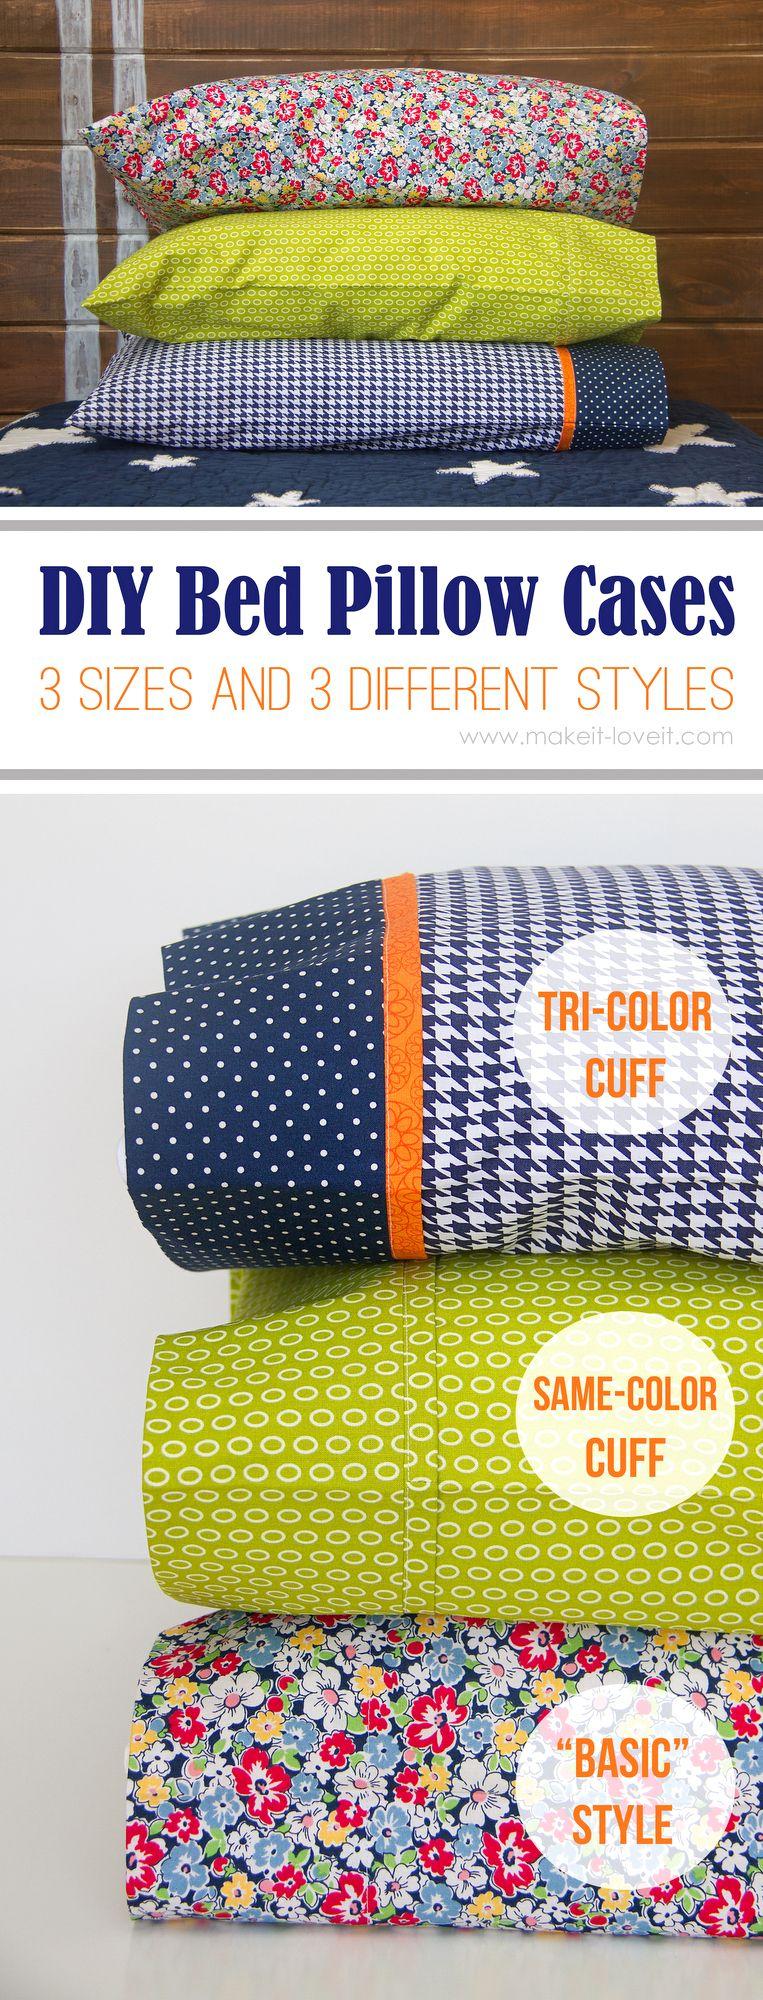 Download New DIY Pillows from makeit-loveit.com